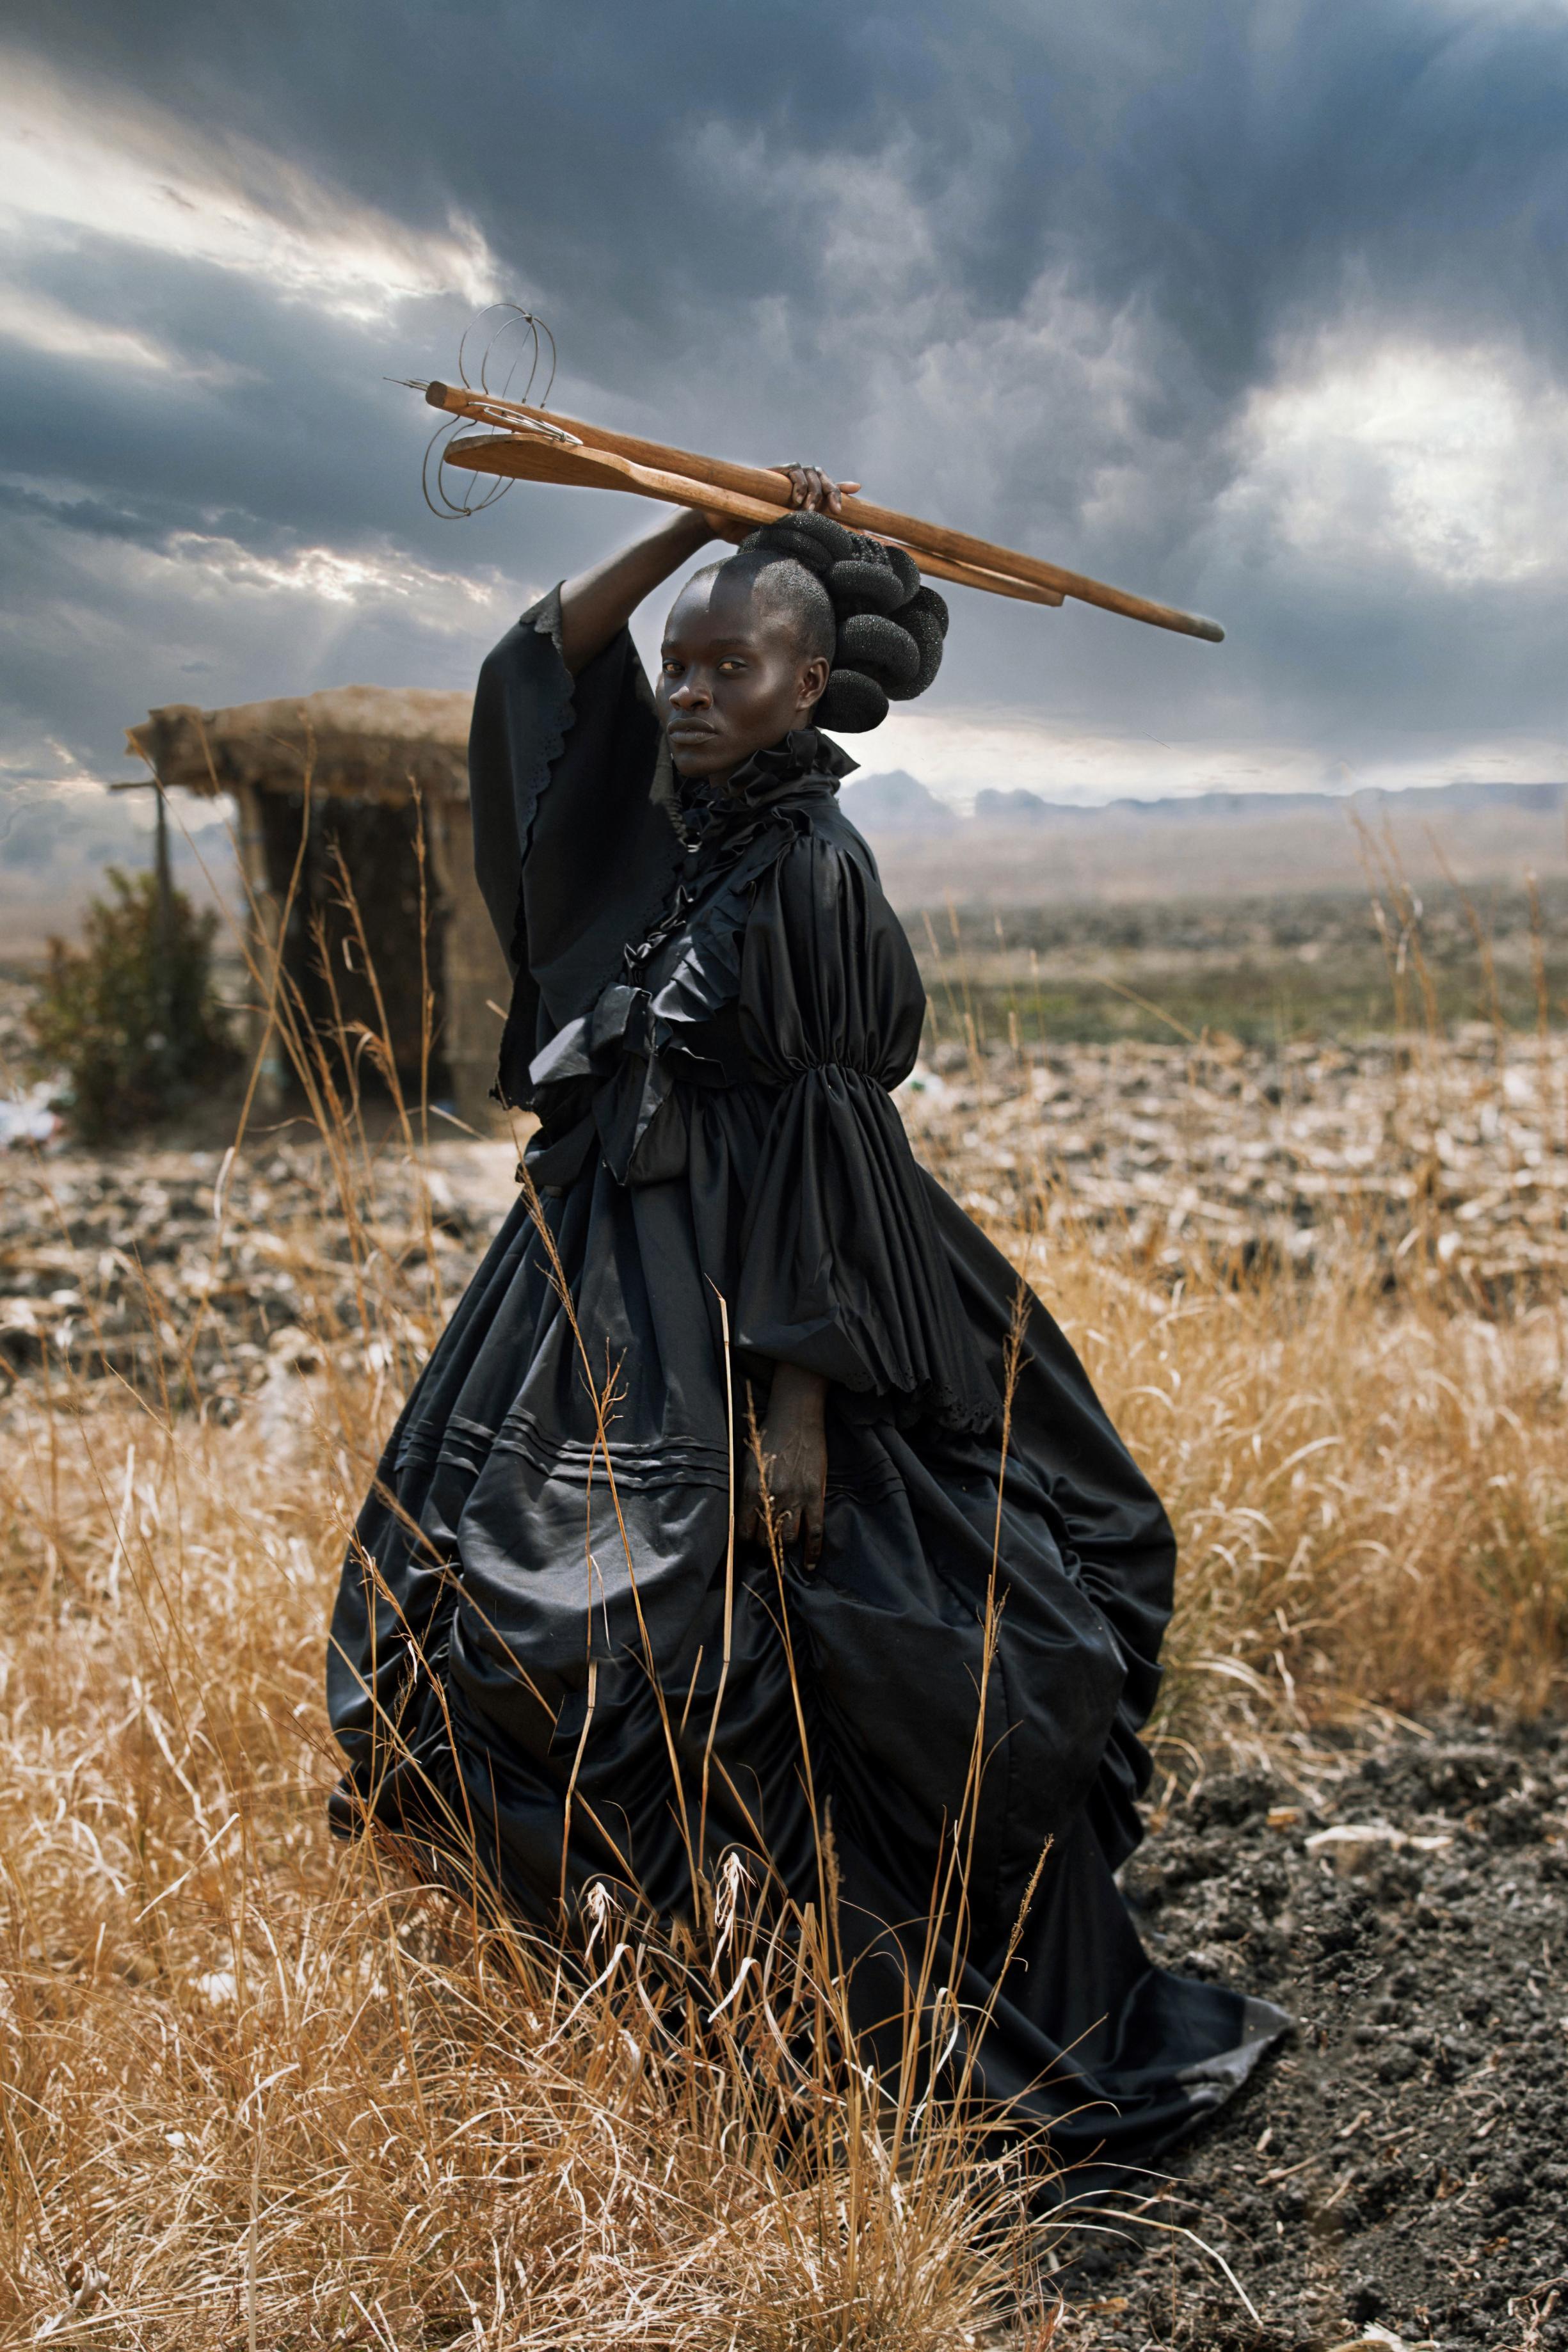 Sony World Photography Awards 2021 best images revealed - CNN Style